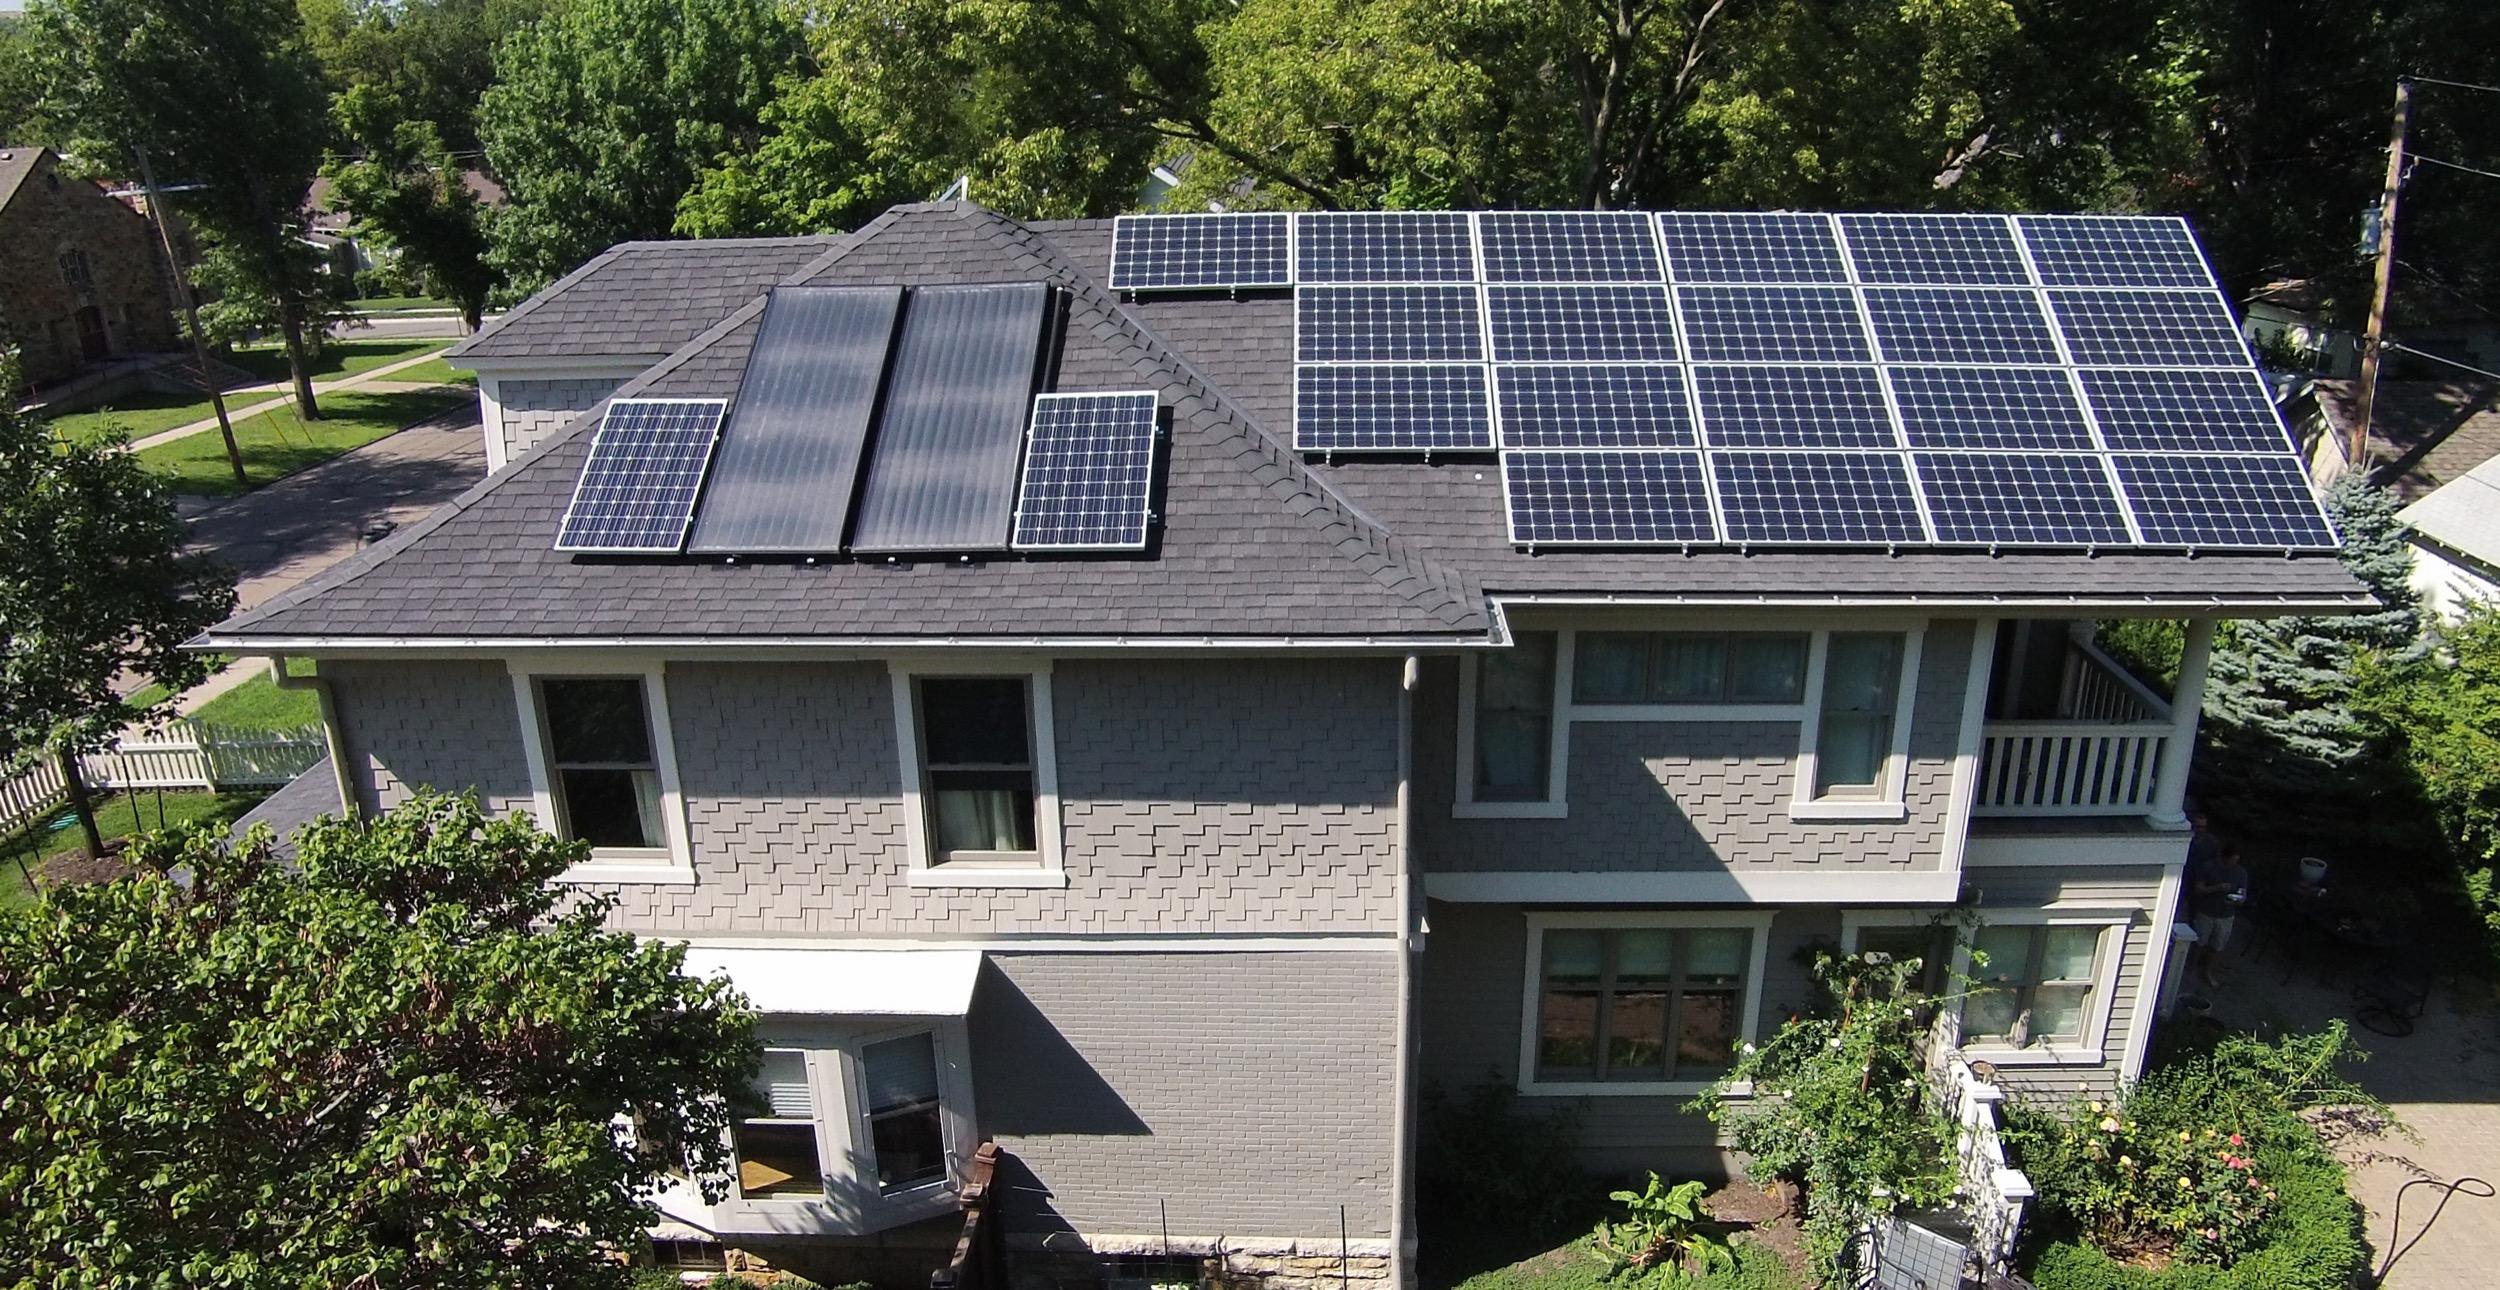 Residential solar array © 2015 Cromwell Environmental